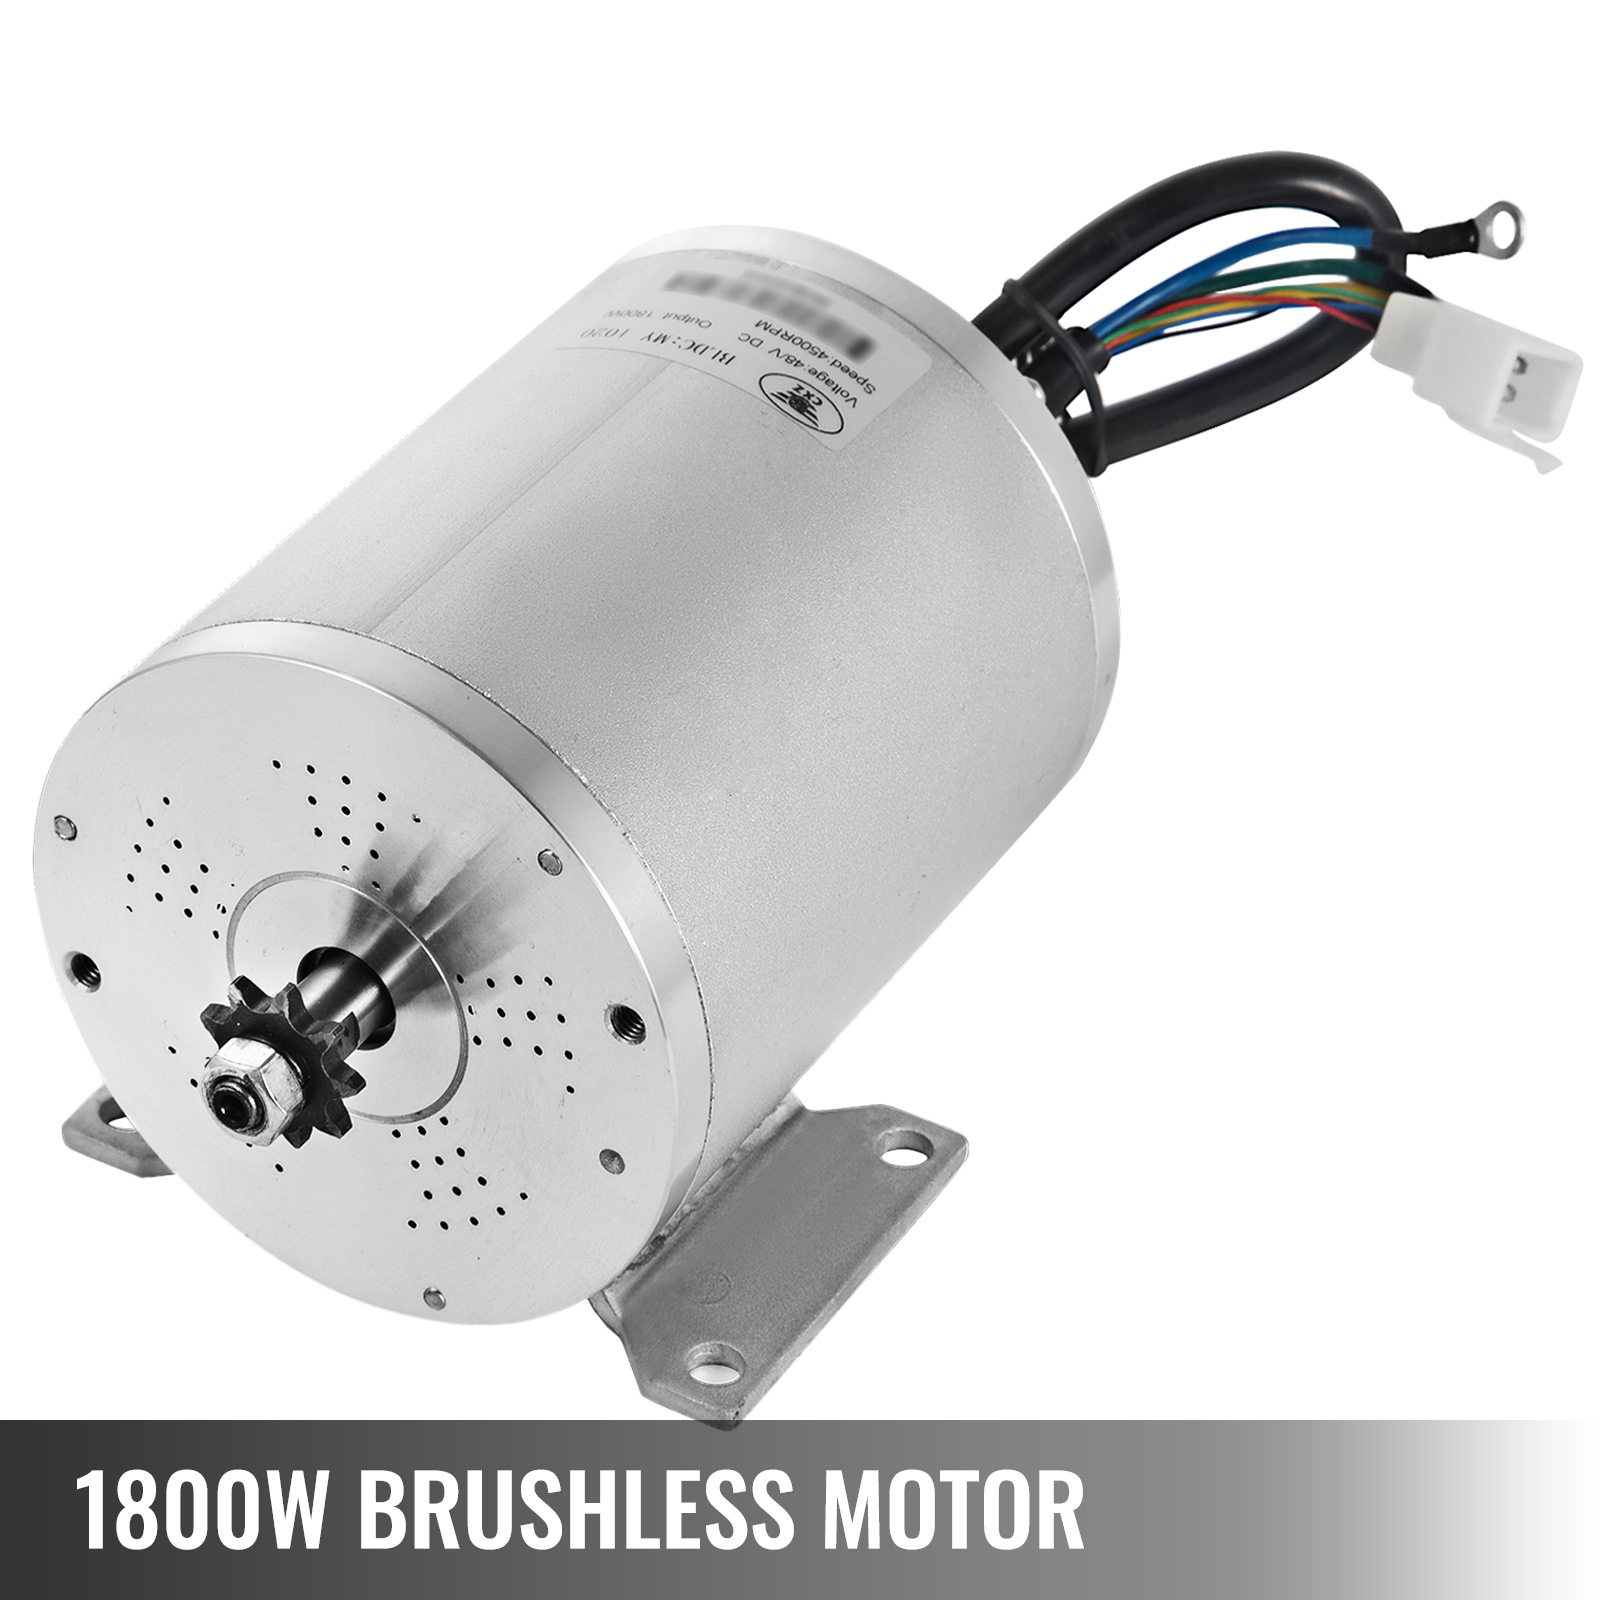 1800W-48V-DC-Brushless-Electric-Motor-Kit-f-Scooter-500-1800W-E-Bike-Go-Kart thumbnail 123